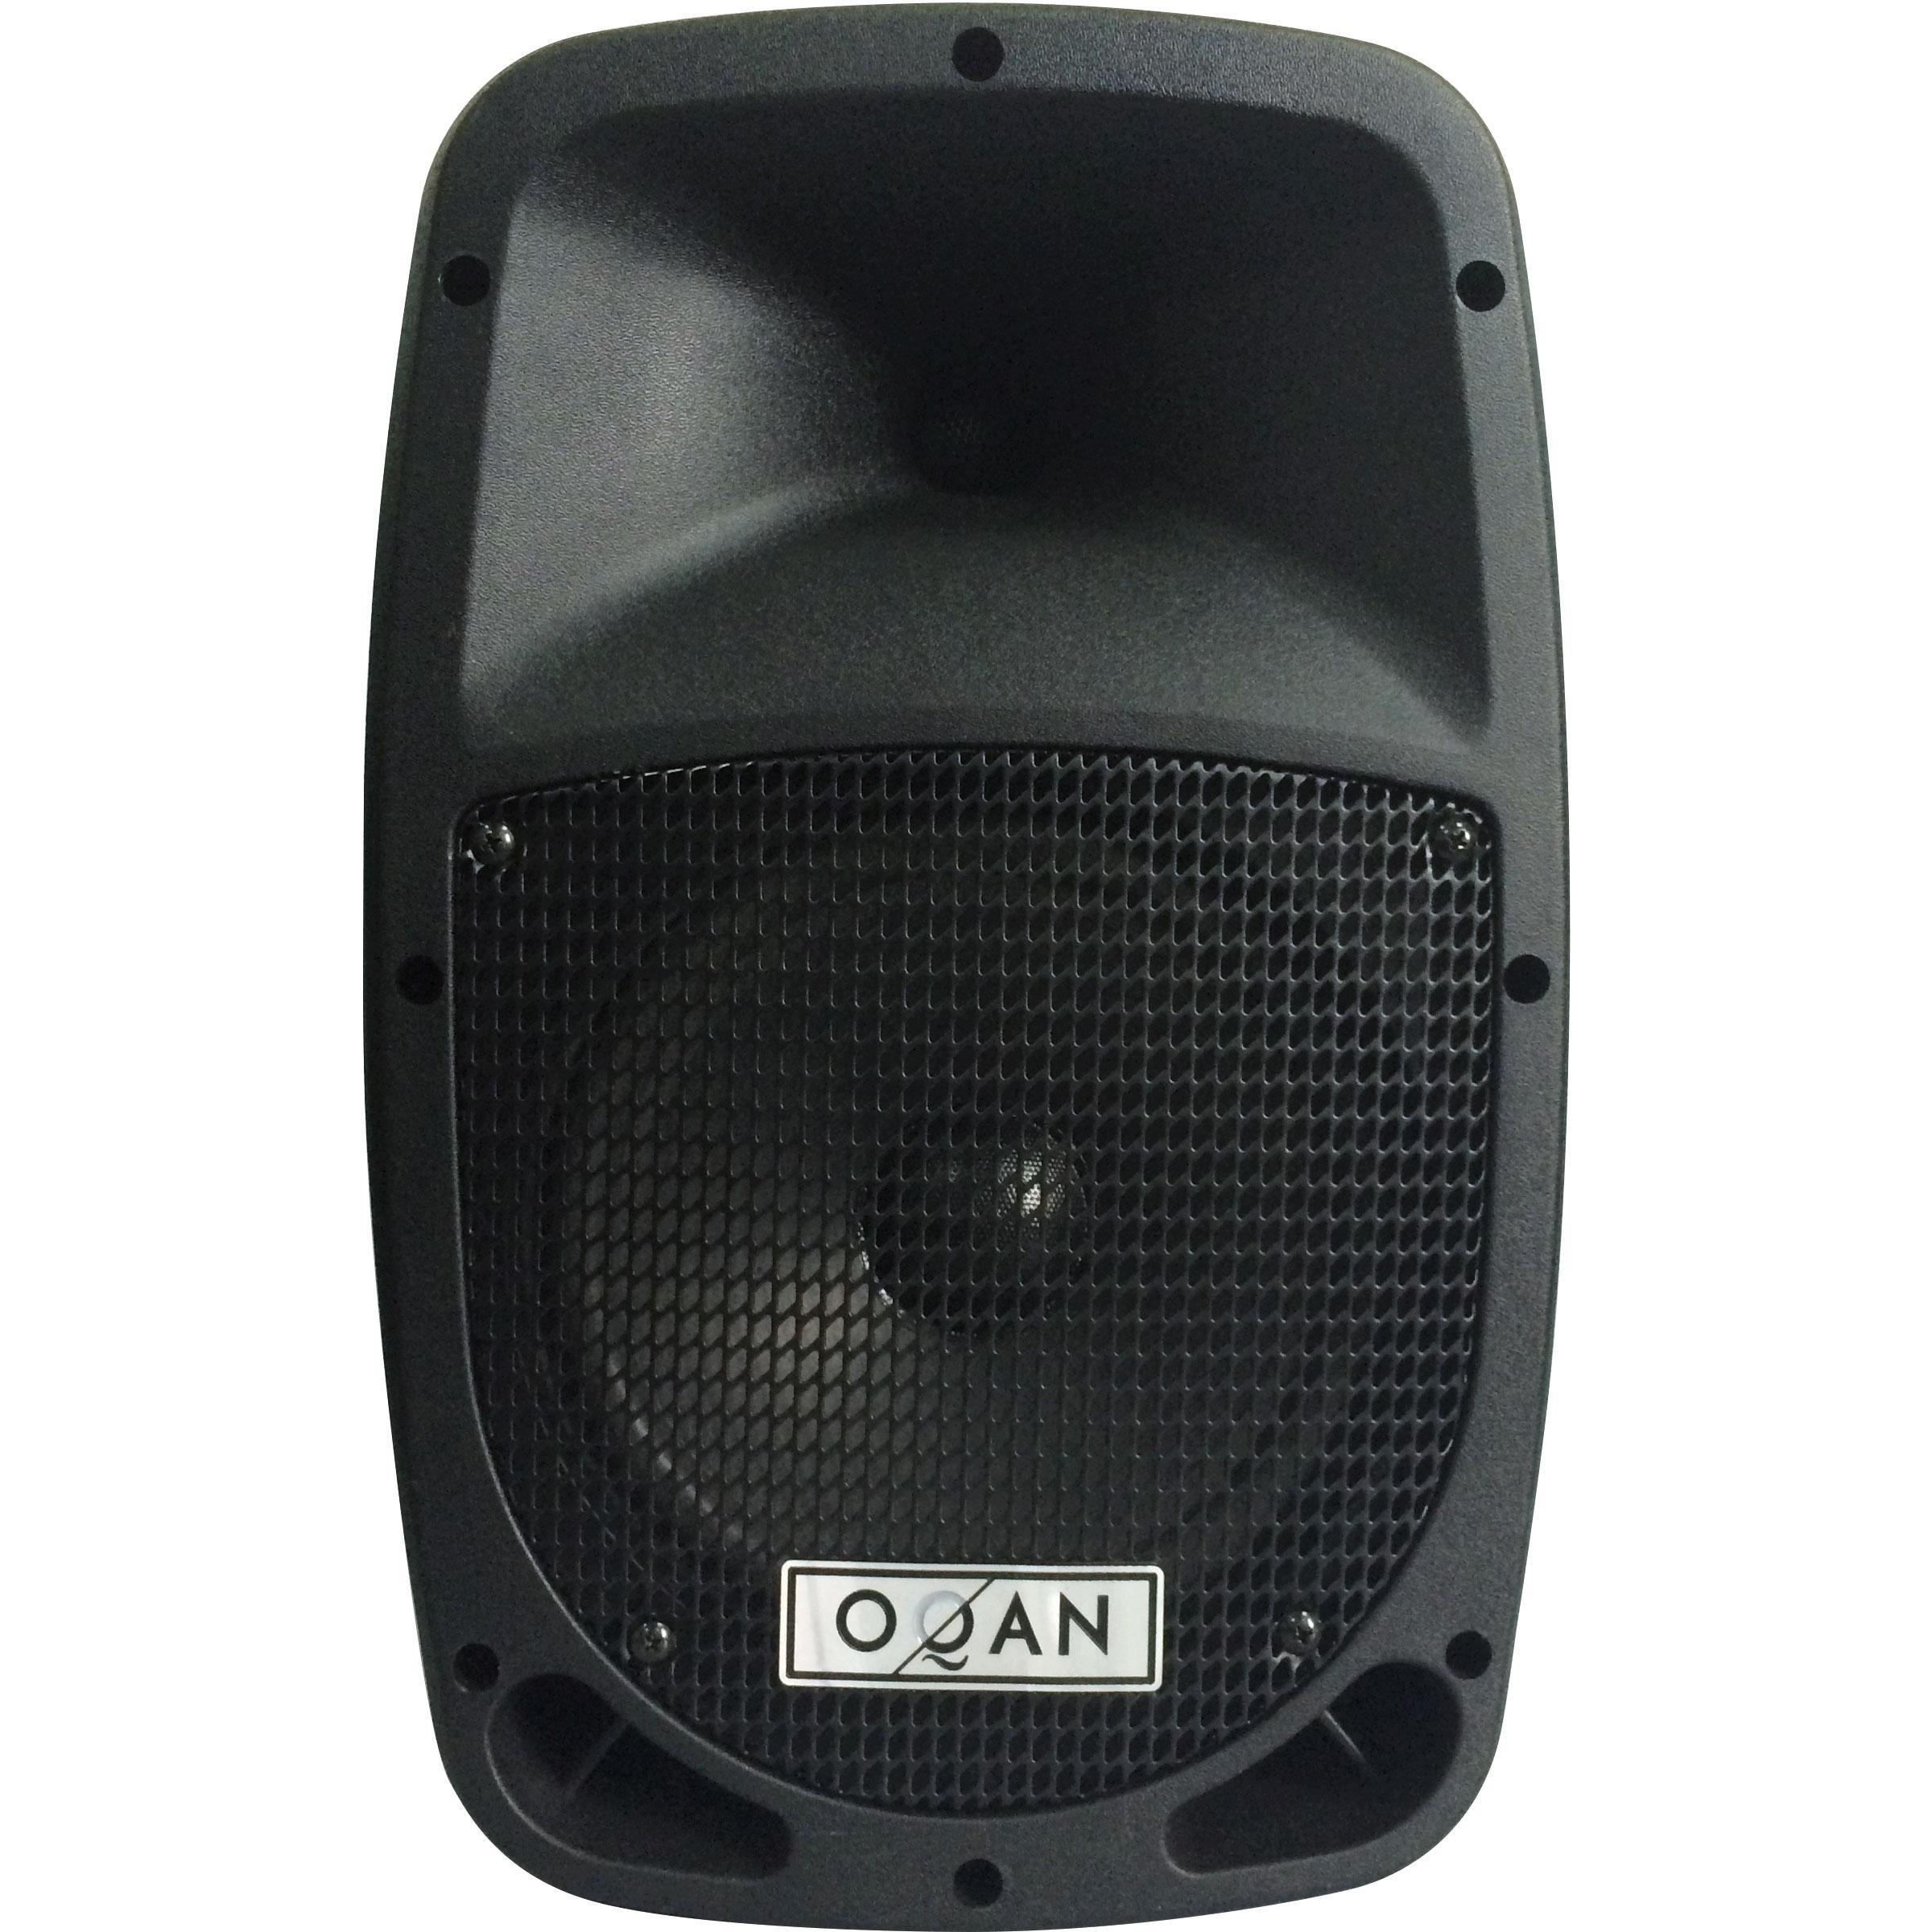 OQAN QLA108 MP3